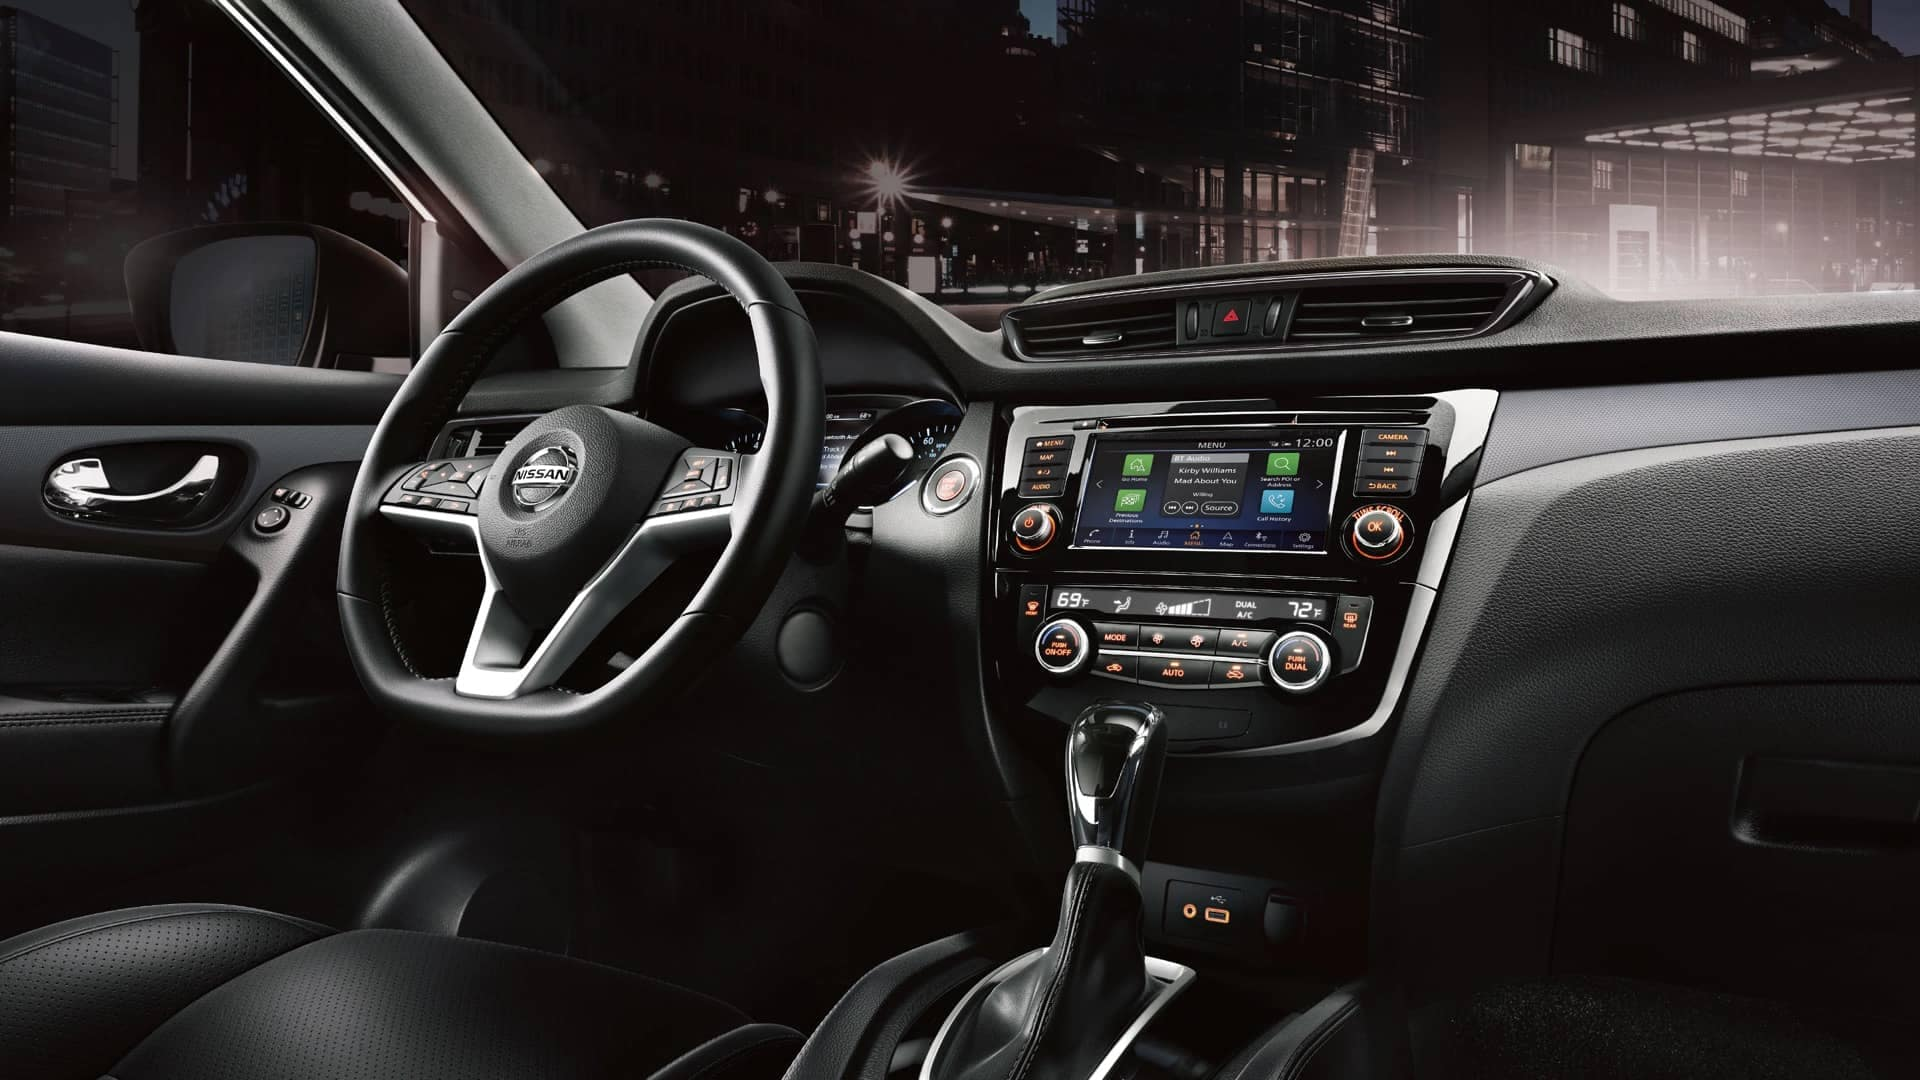 2020 Nissan Rogue S Interior